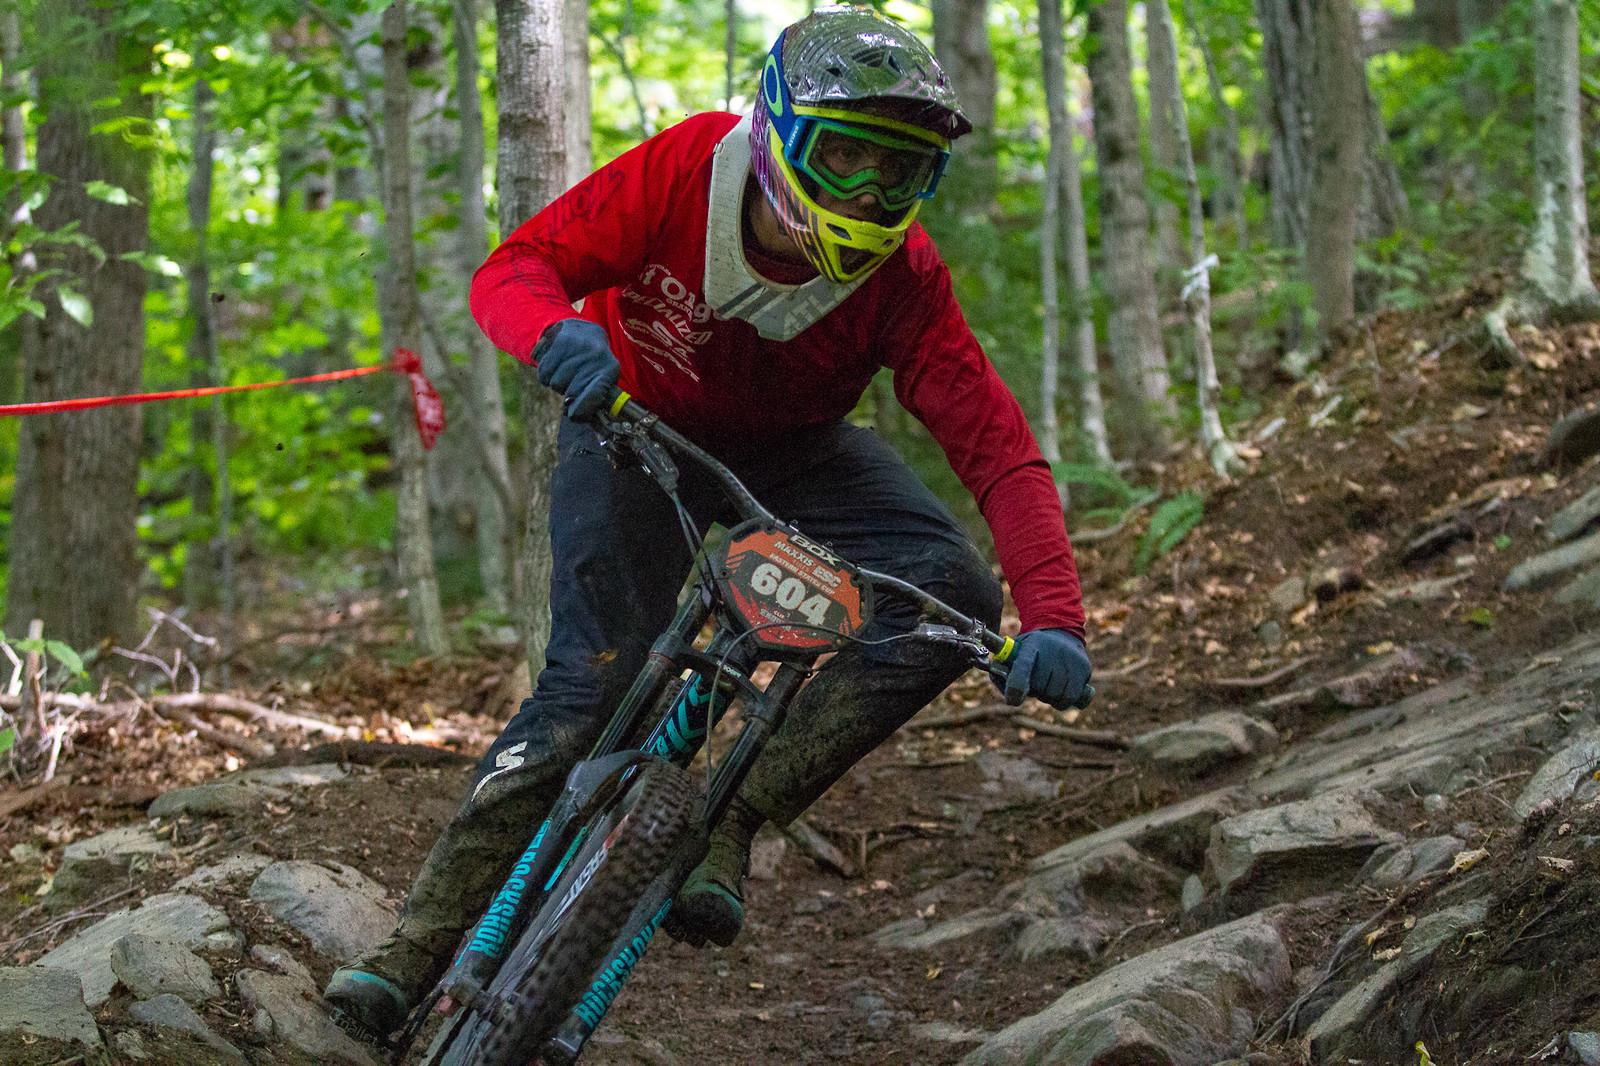 Antoine Jacques - JackRice - Mountain Biking Pictures - Vital MTB